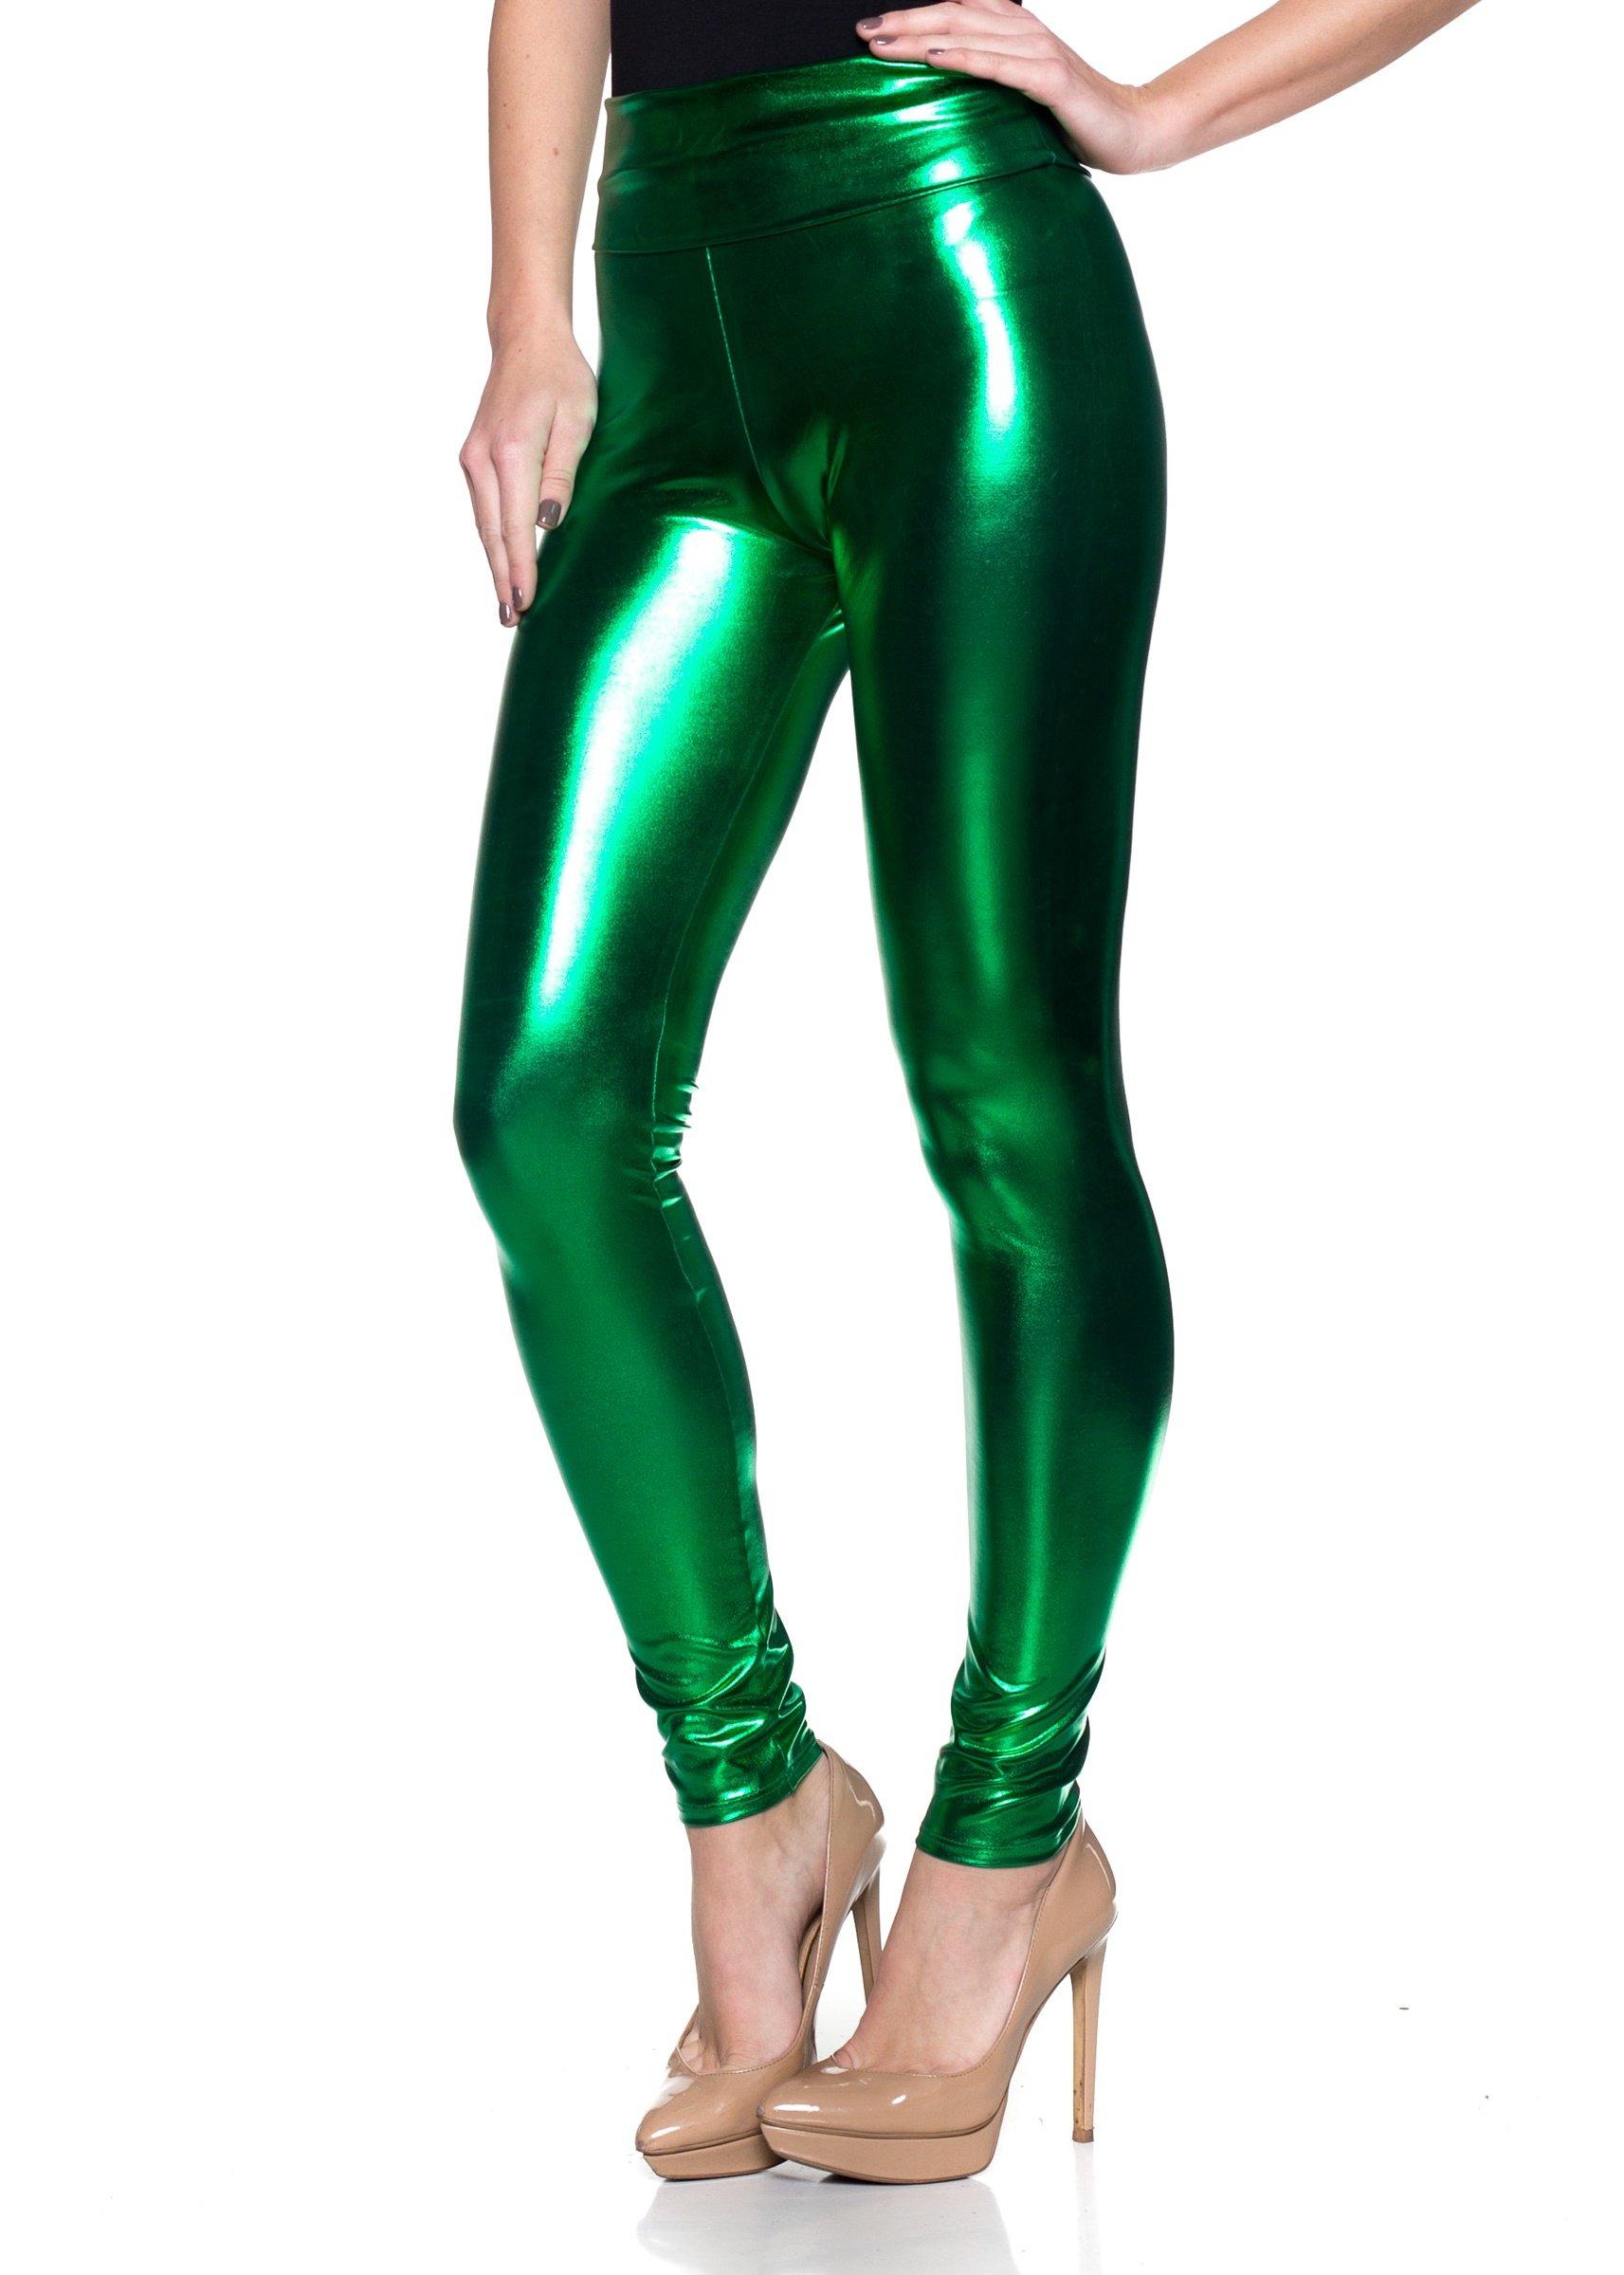 J2 Love Women's Junior Plus Faux Leather High Waist Leggings, 2X, Green